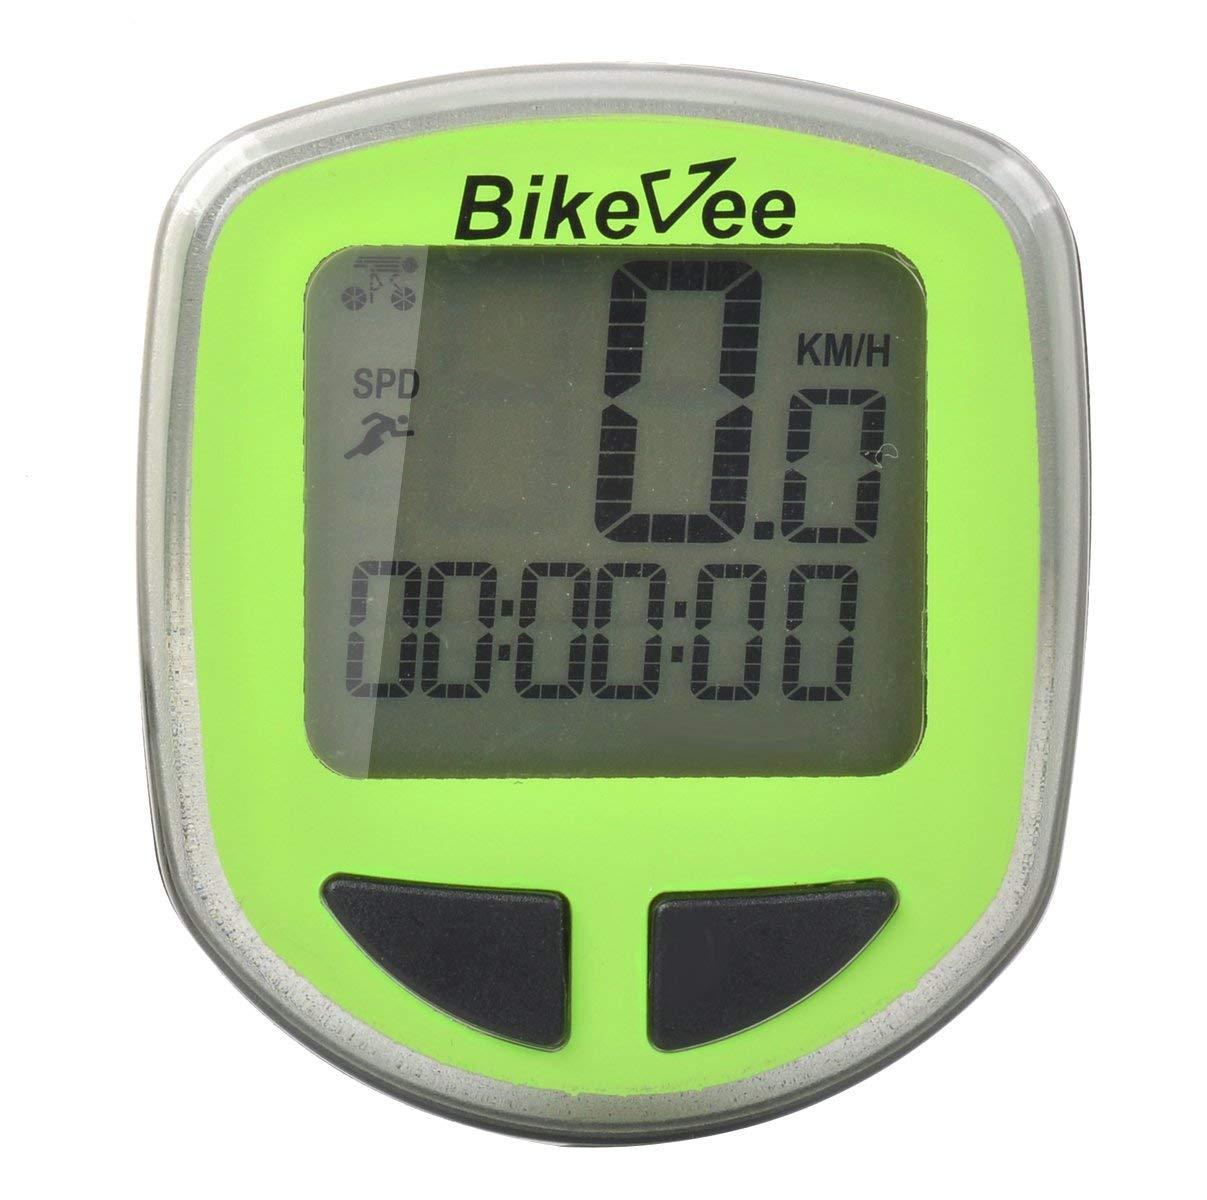 OLSUS Stopwatch - Green Multifunctional Display Bicycle Stopwatch